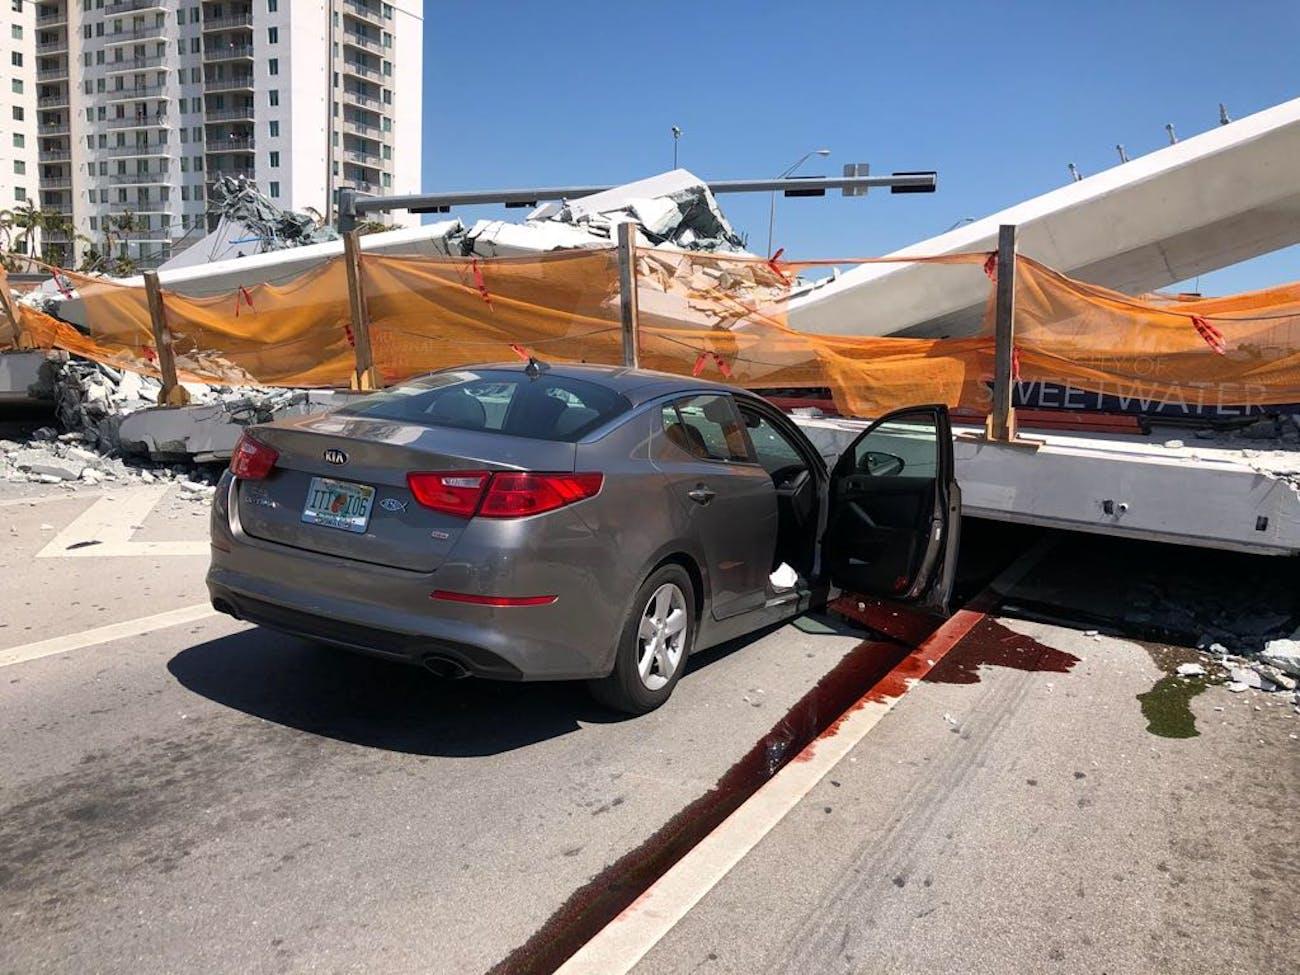 Miami pedestrian bridge collapse